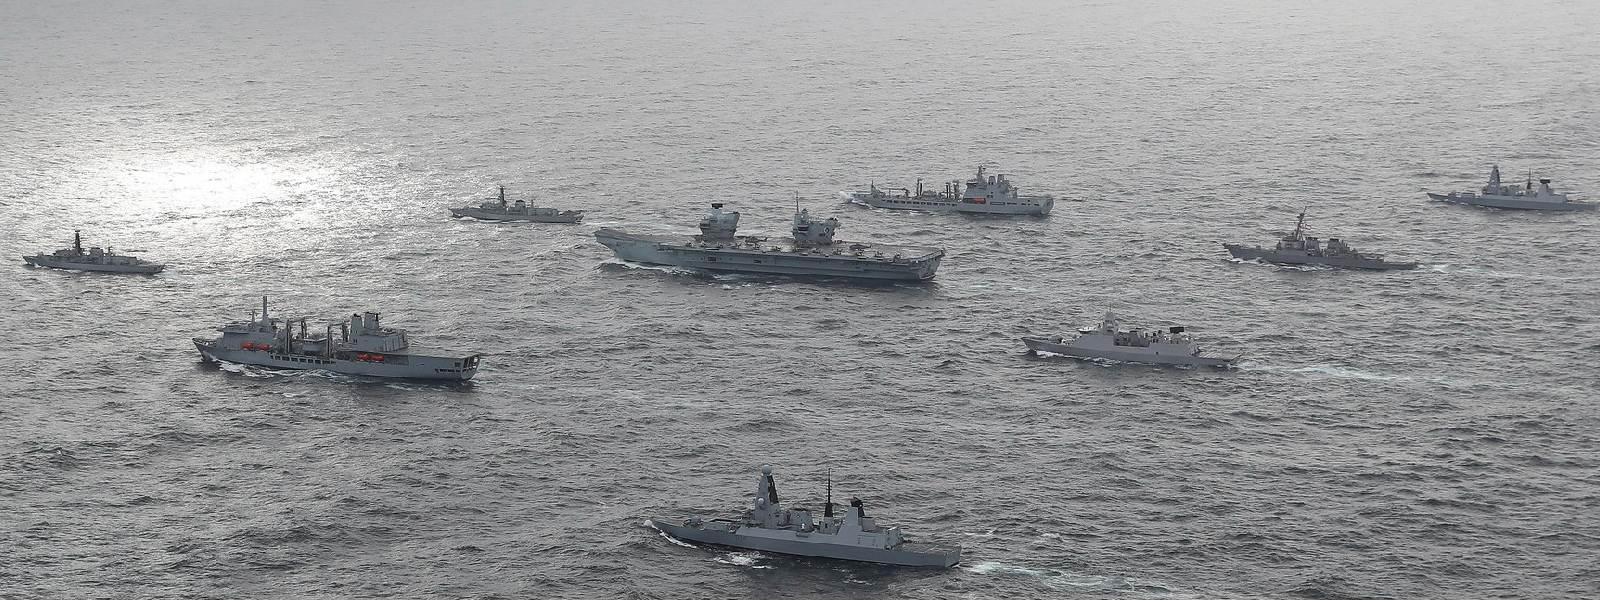 UK Carrier Strike Group reaches Indian Ocean region